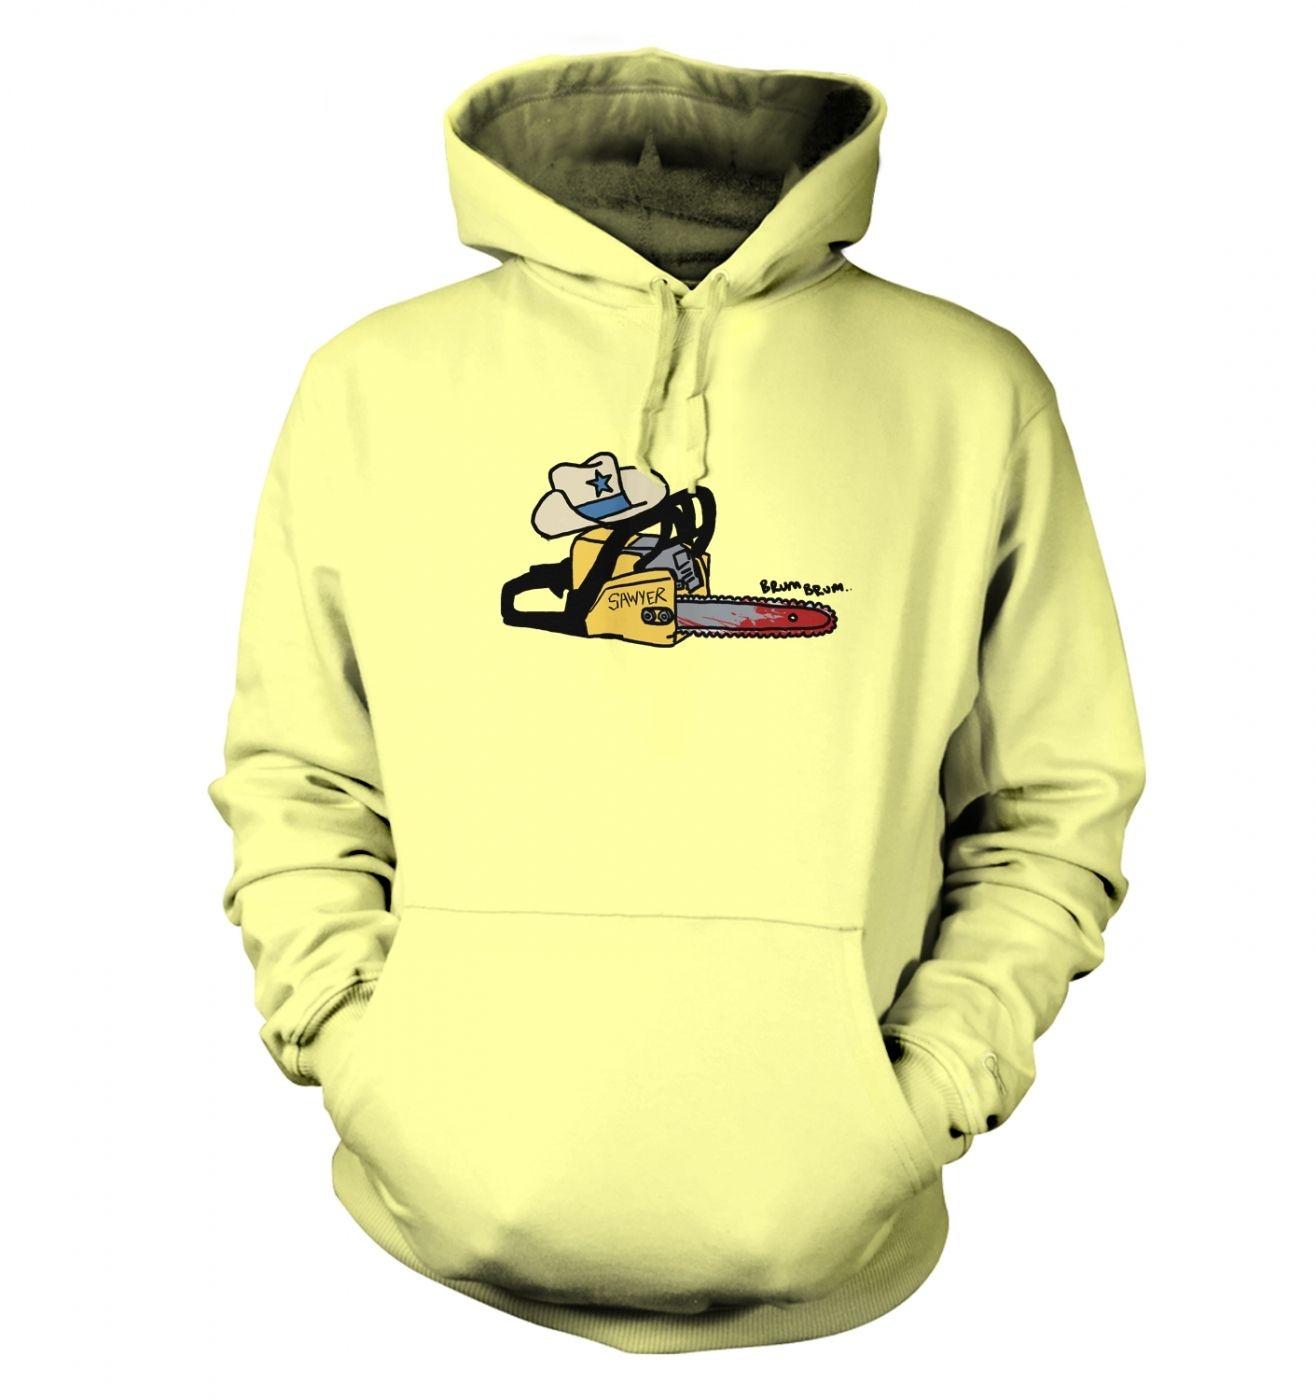 Texas Chainsawyer adults' hoodie